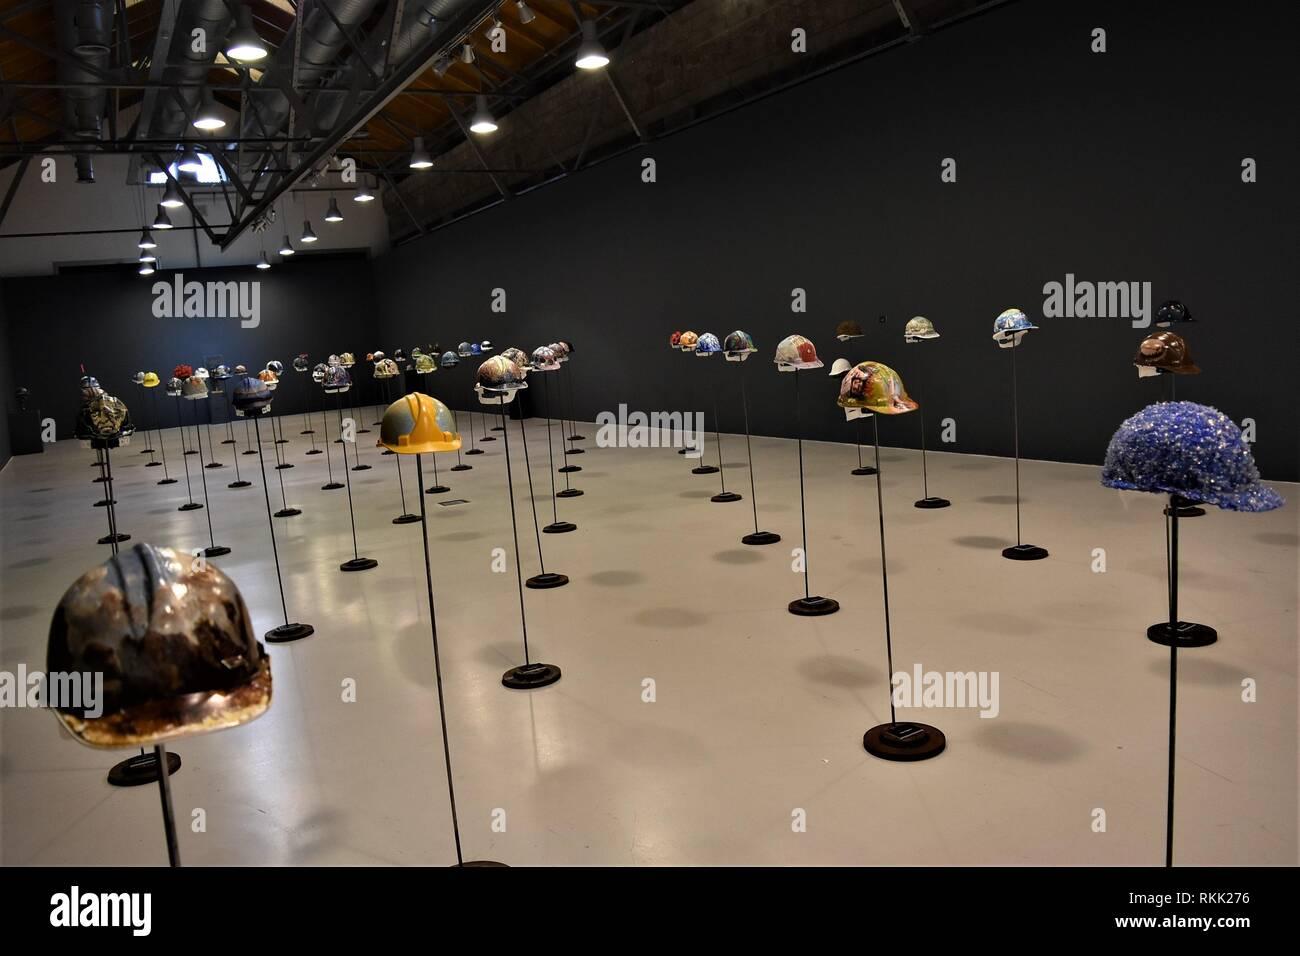 Ankara, Turkey  17th Jan, 2019  Artwork helmets are displayed during